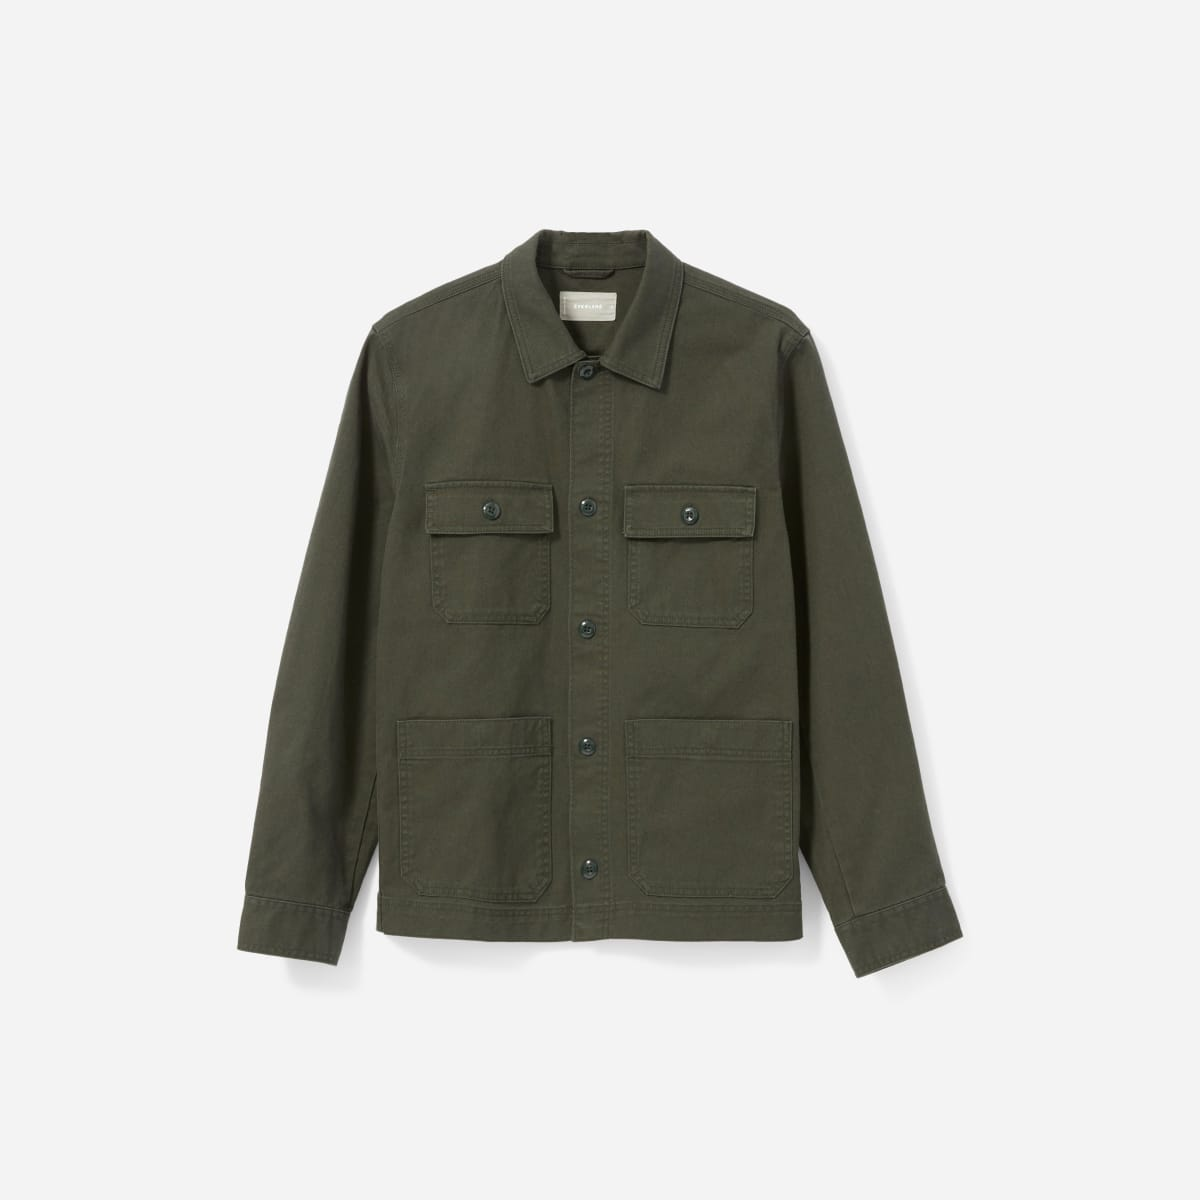 Everlane men's shirt jacket